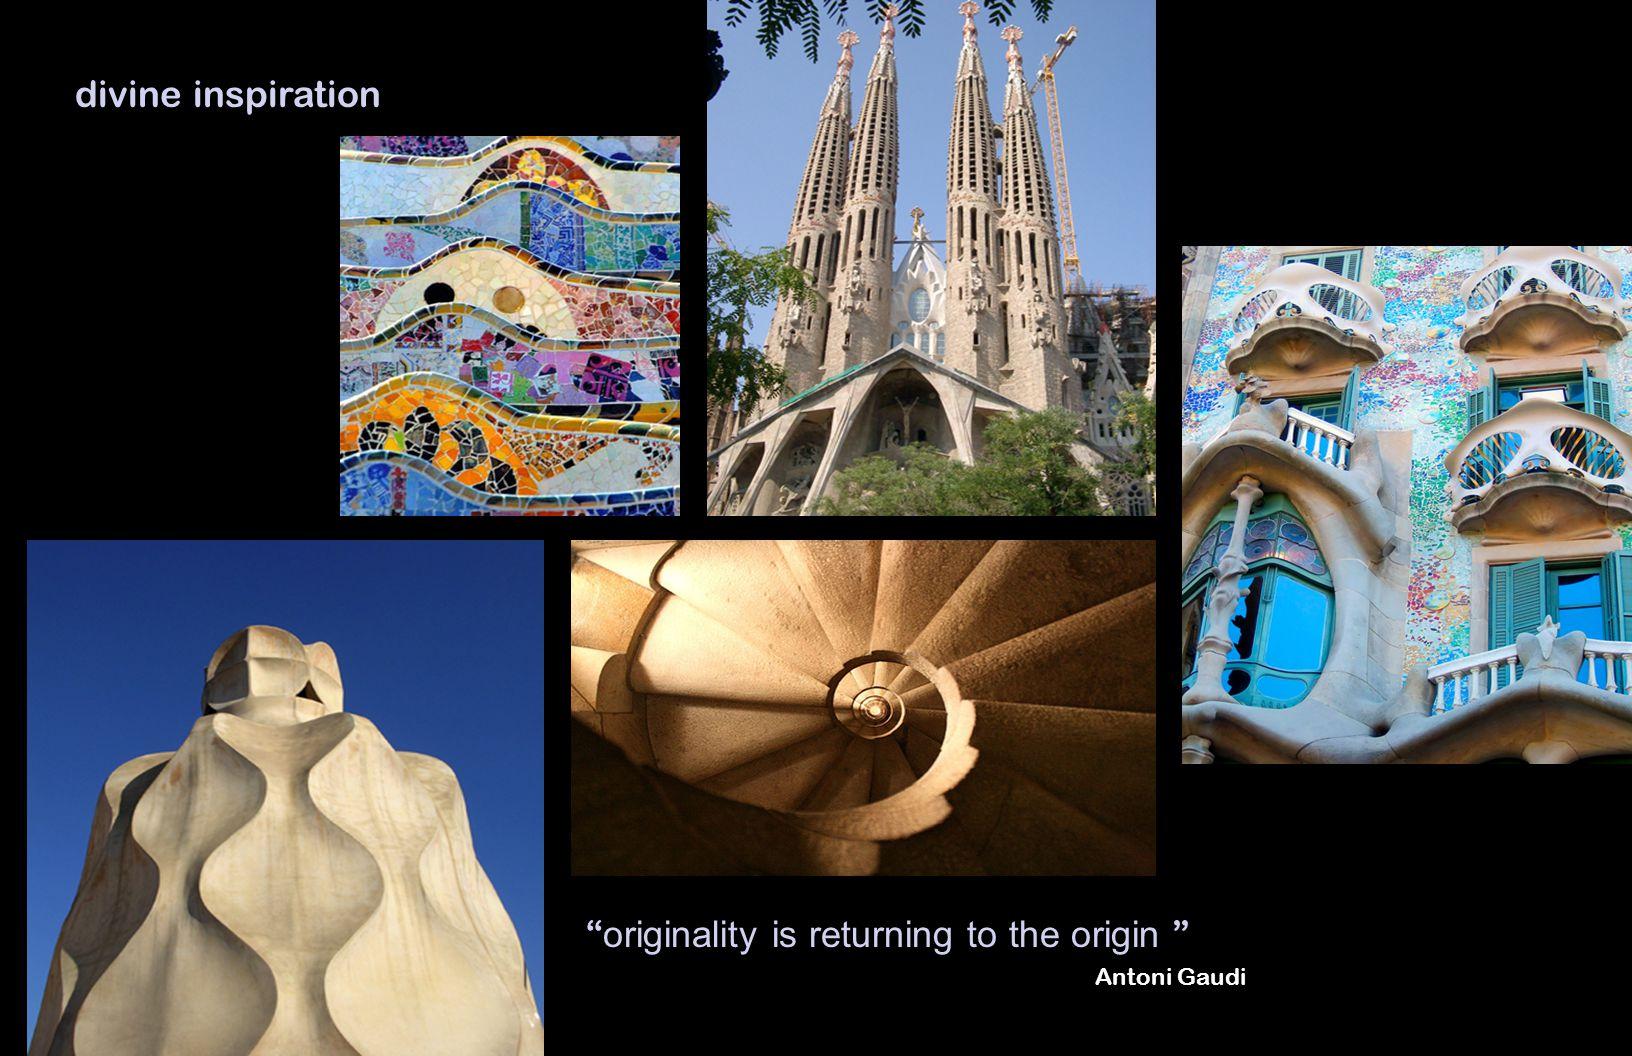 originality is returning to the origin Antoni Gaudi divine inspiration